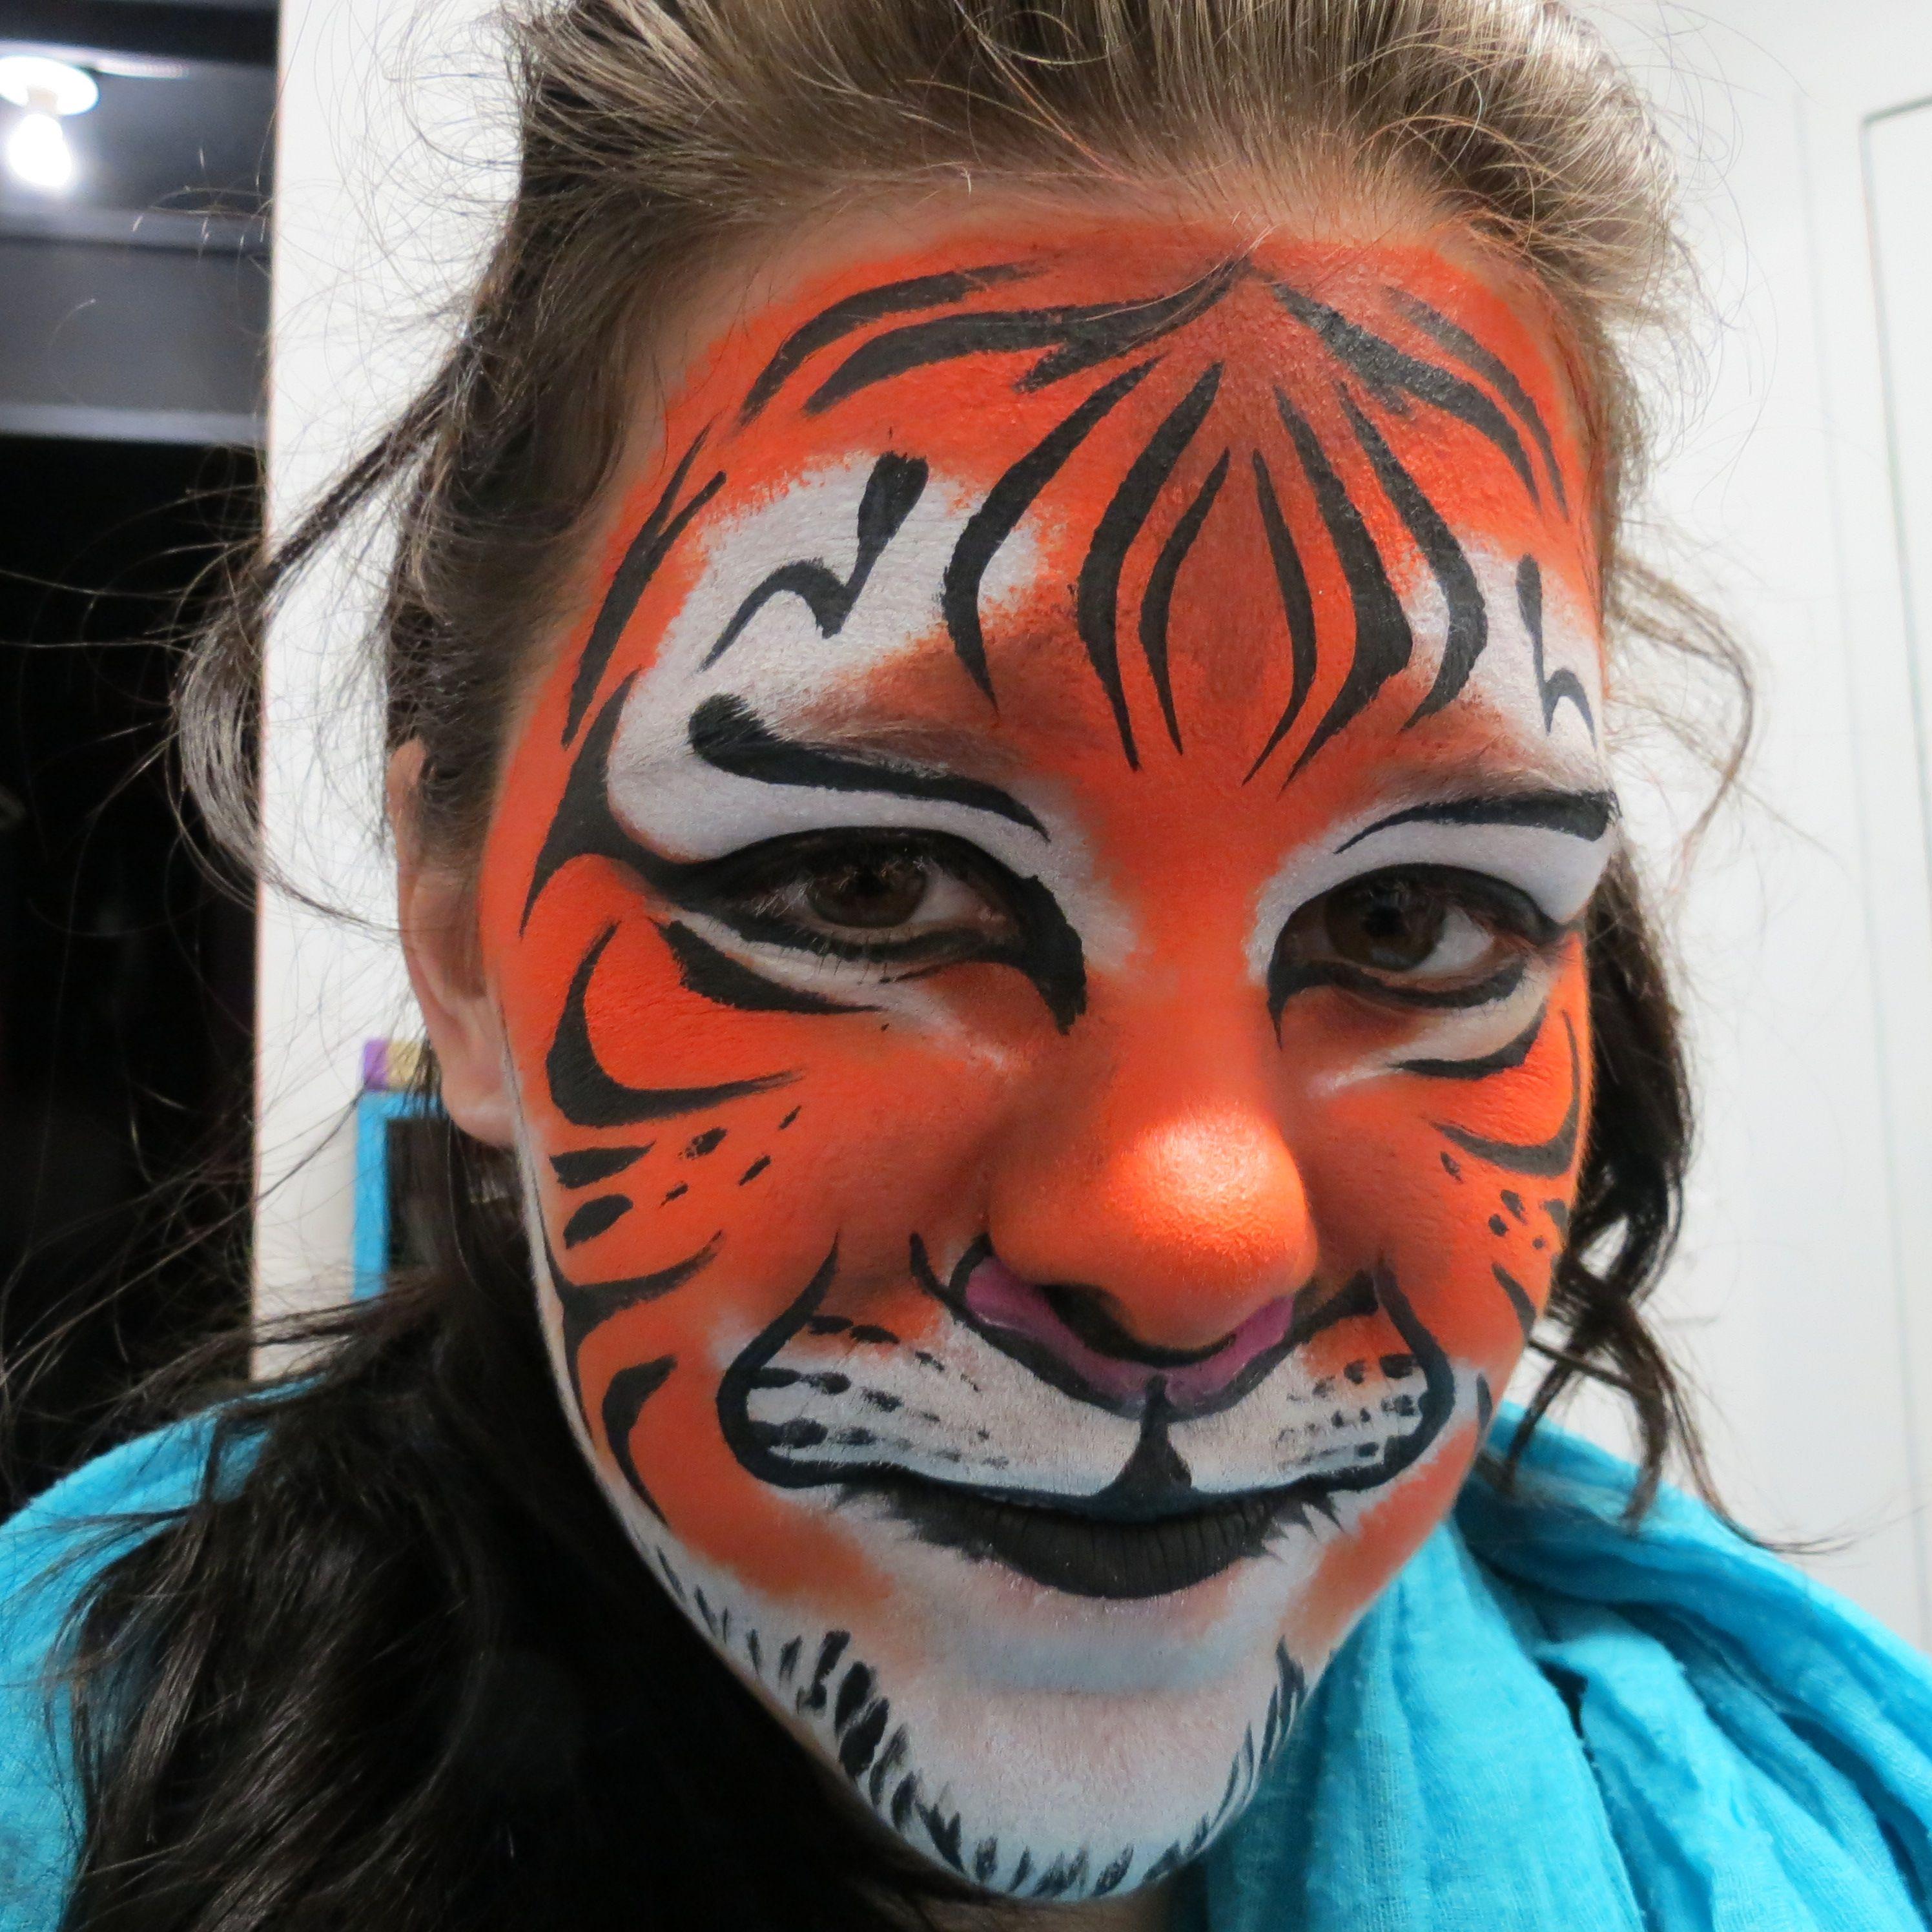 maquillage pour enfant tigre children make up tiger face painting for kids maquillage pour. Black Bedroom Furniture Sets. Home Design Ideas